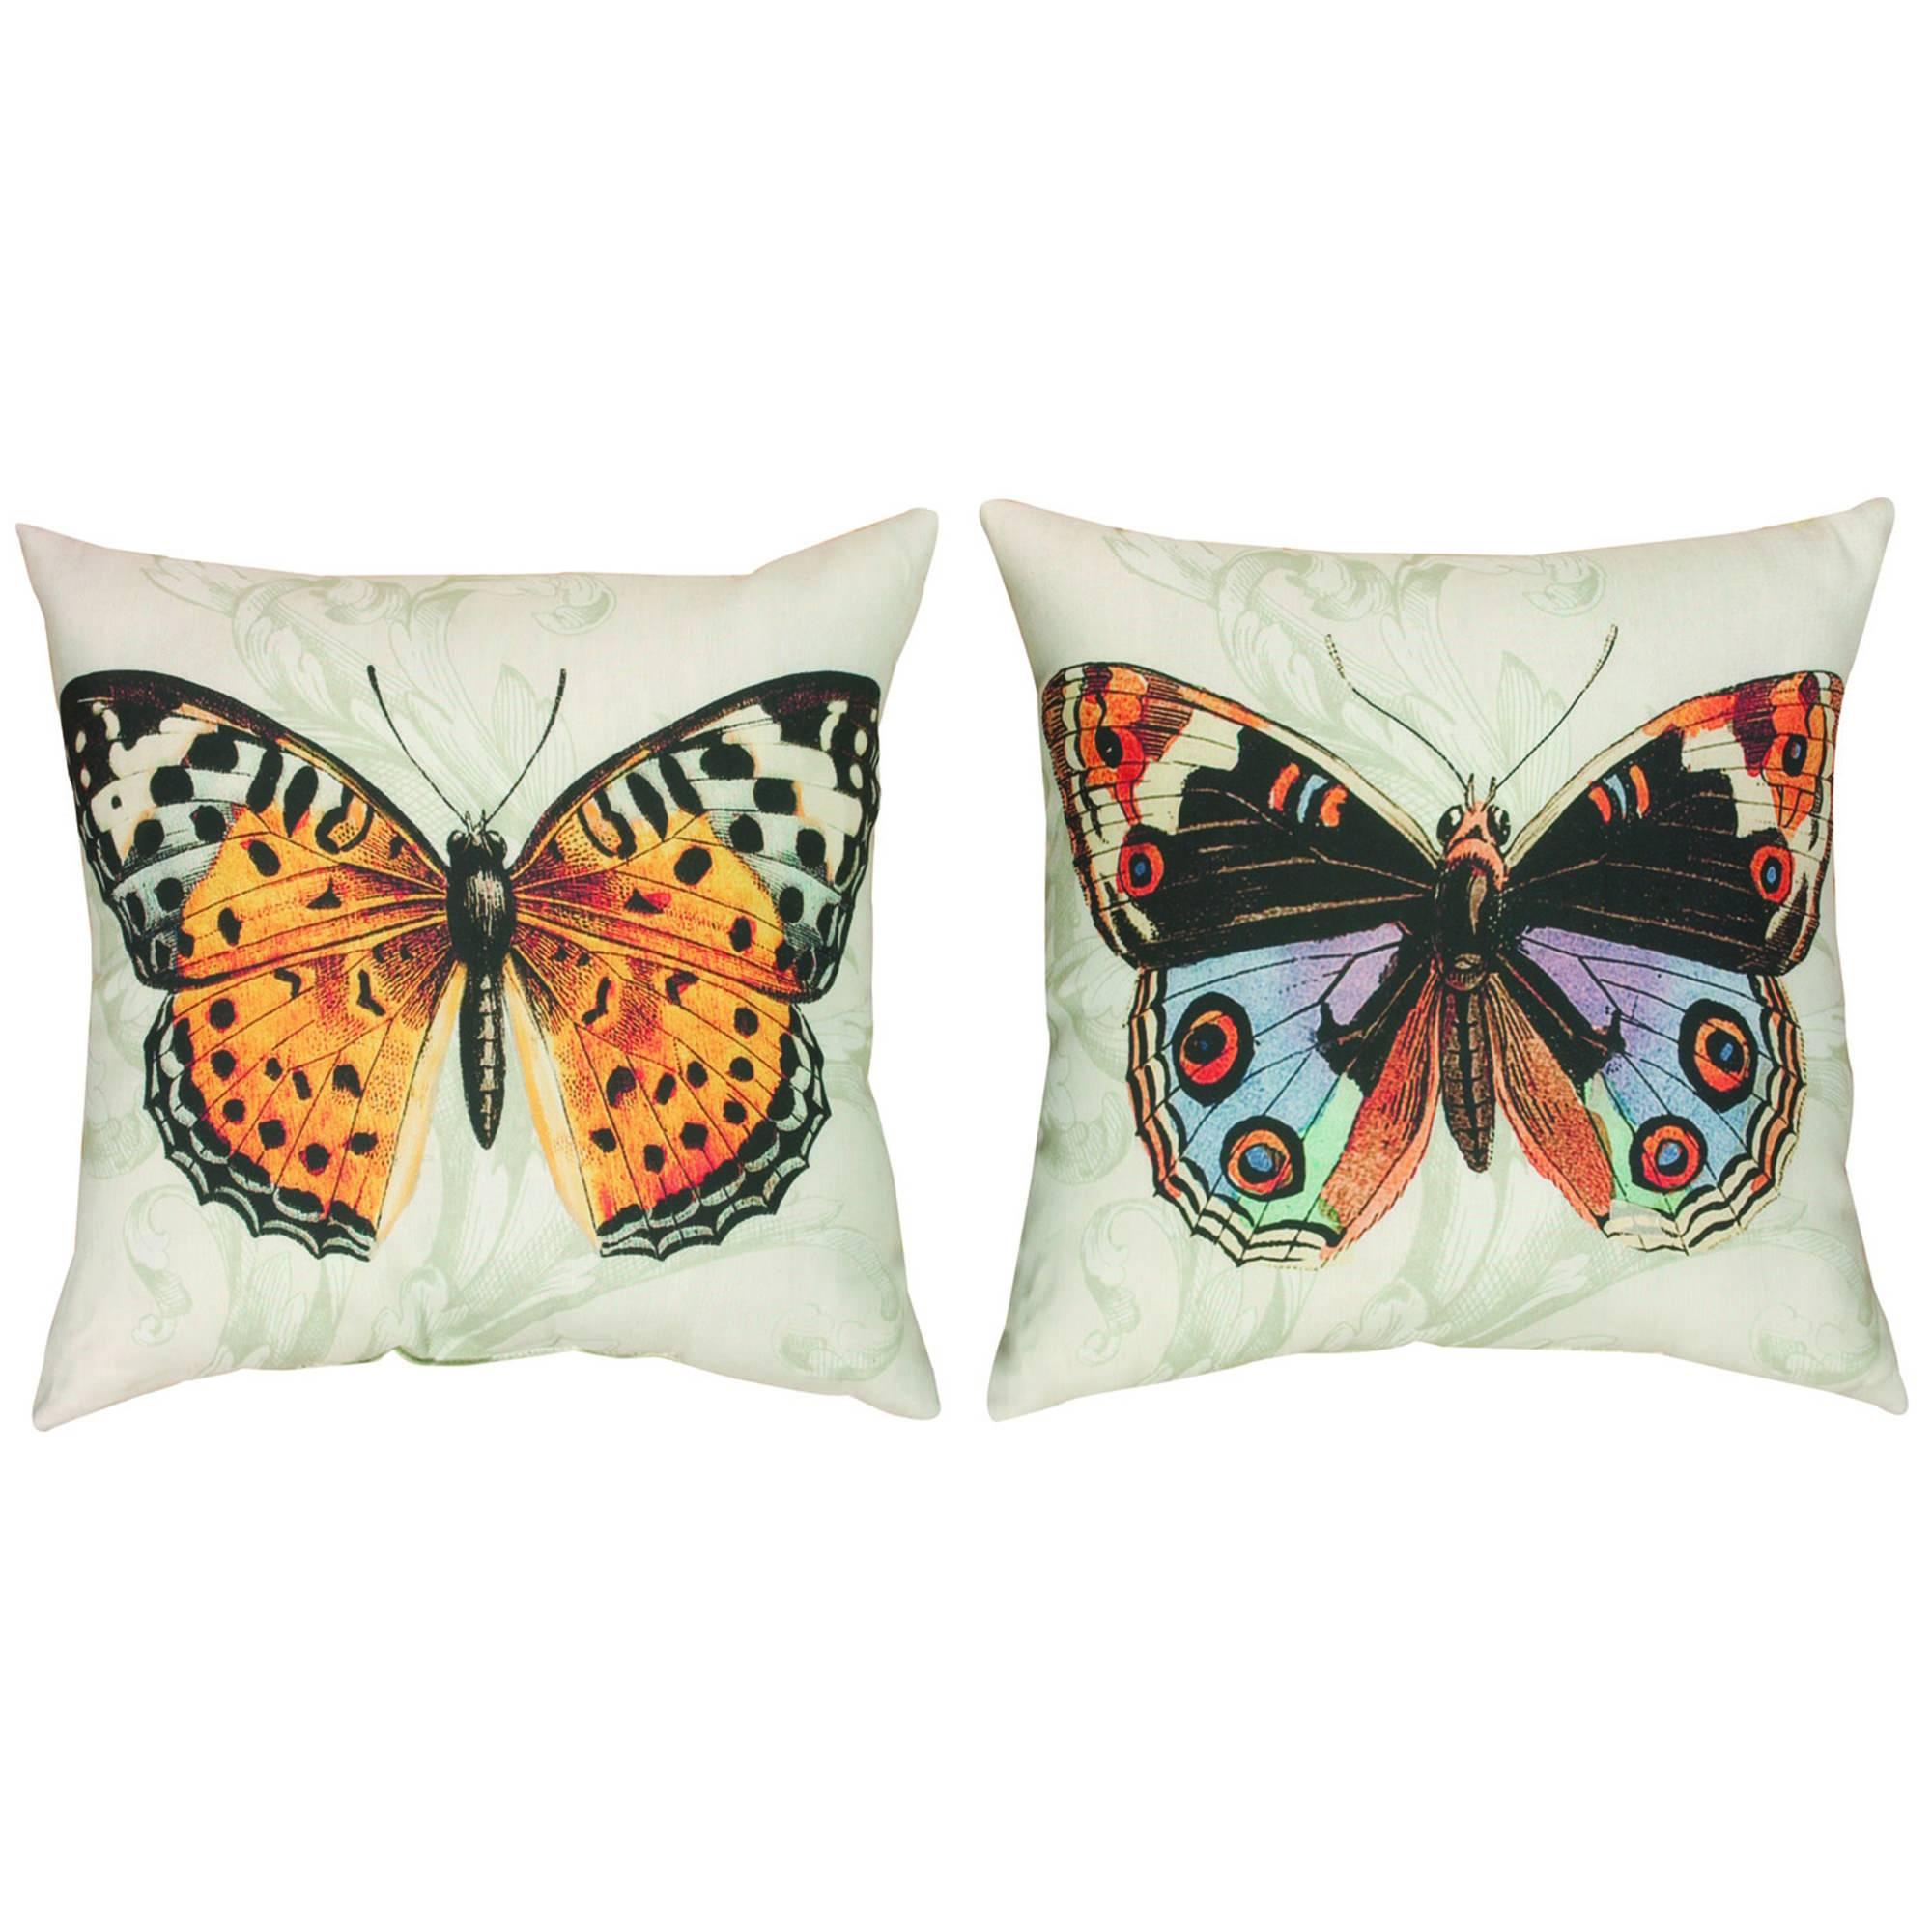 Fly Away 1 Outdoor Pillow